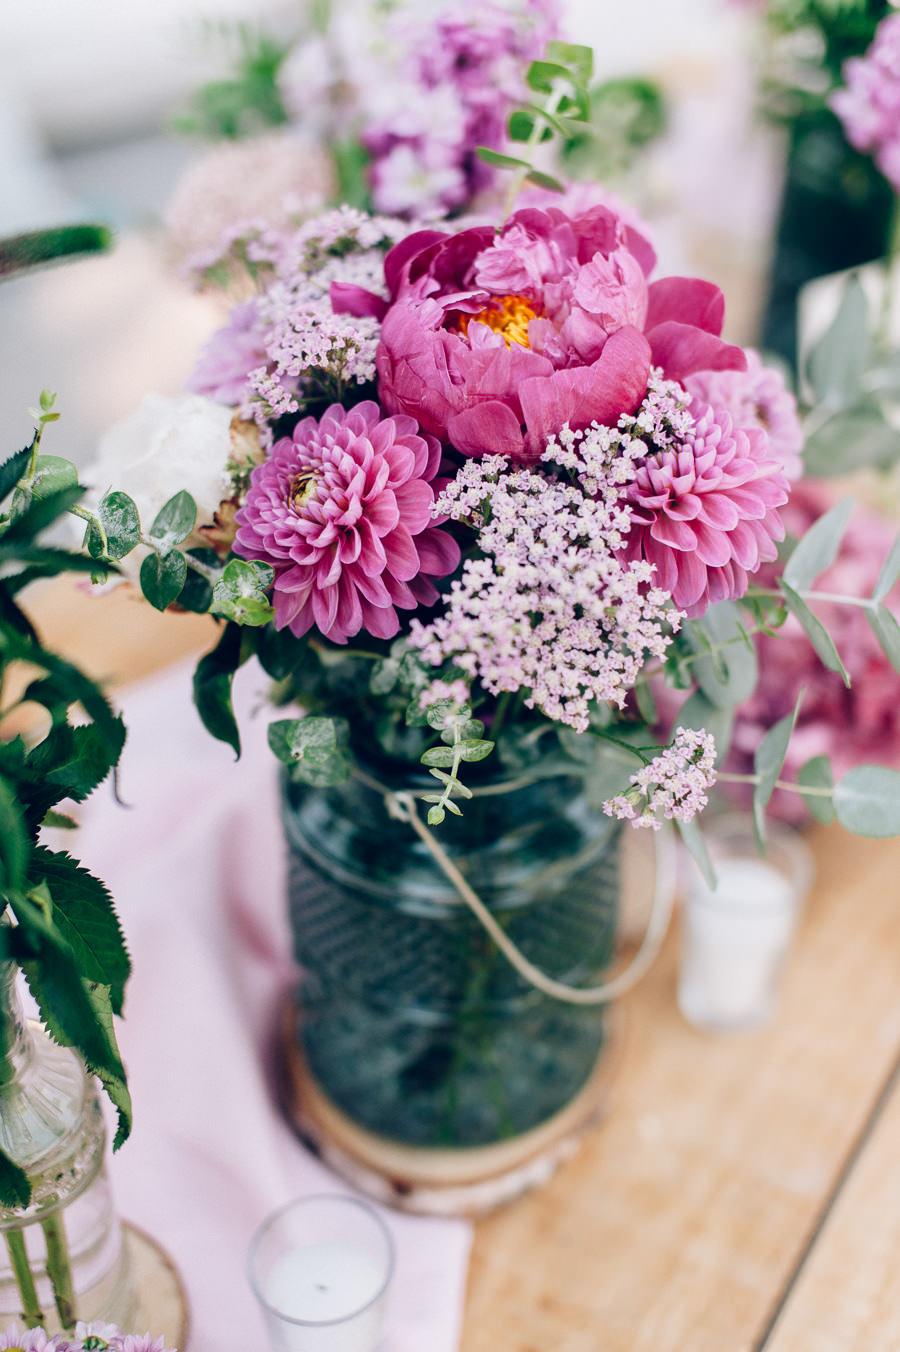 Flores para decorar tipis chill out 5